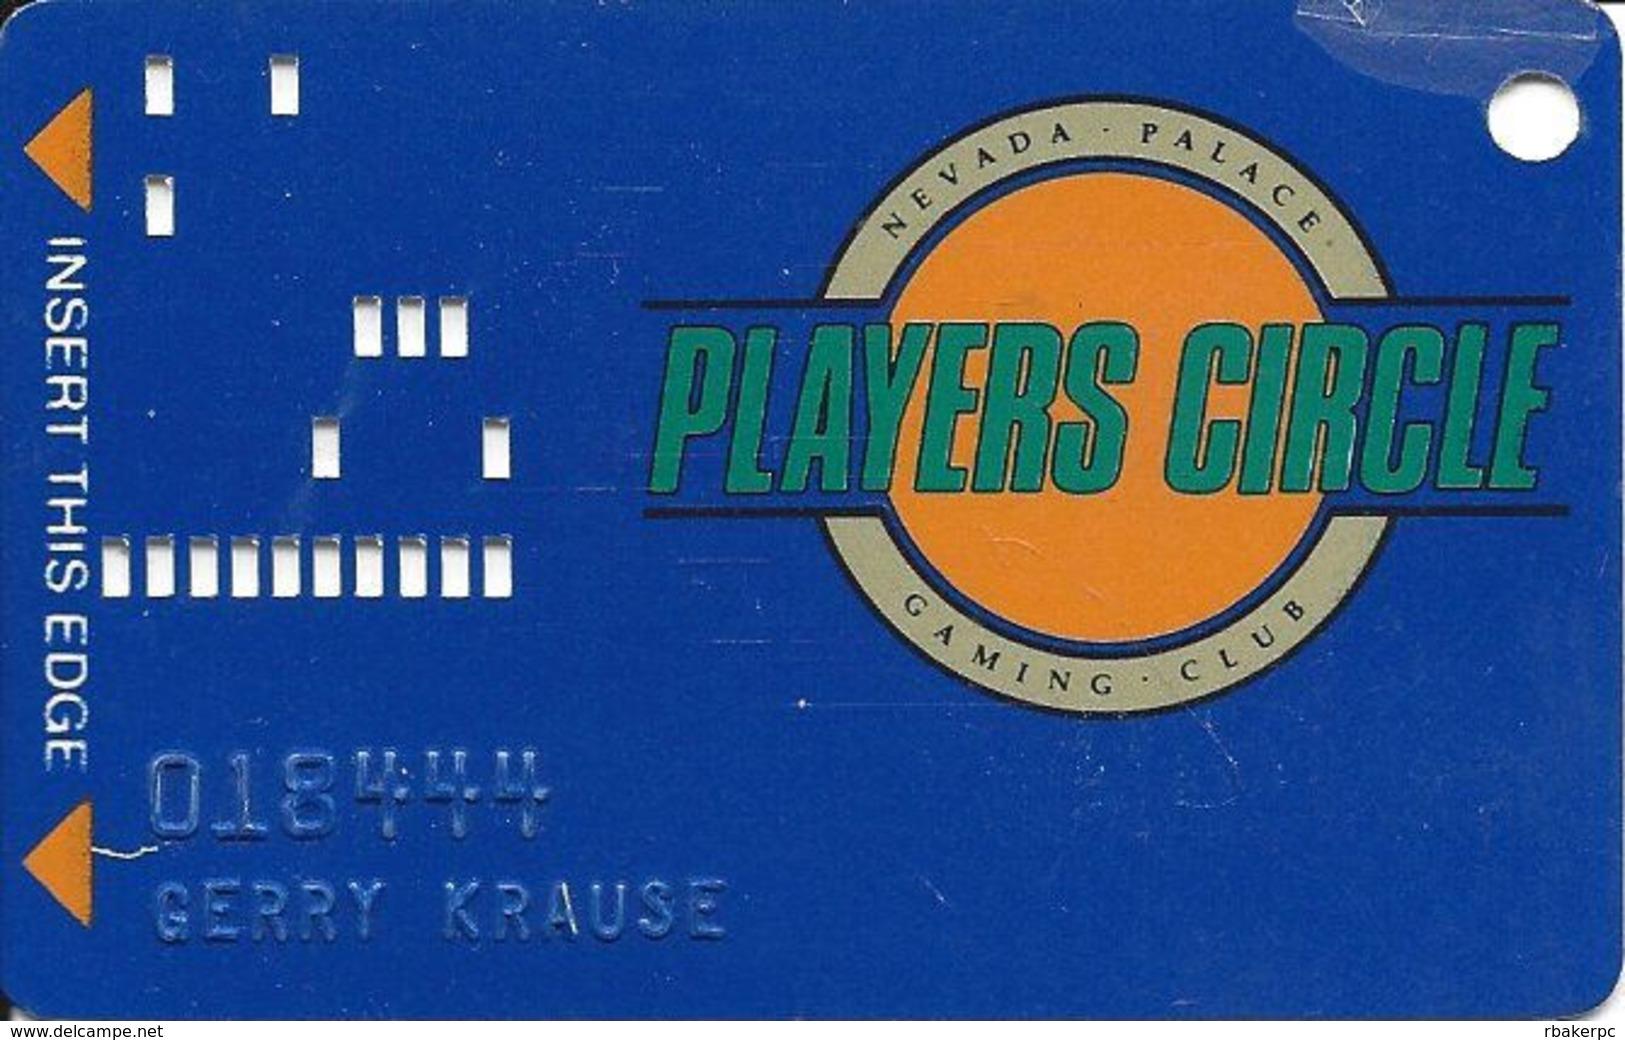 Nevada Palace Casino - Las Vegas NV - 2nd Issue Slot Card - Casino Cards